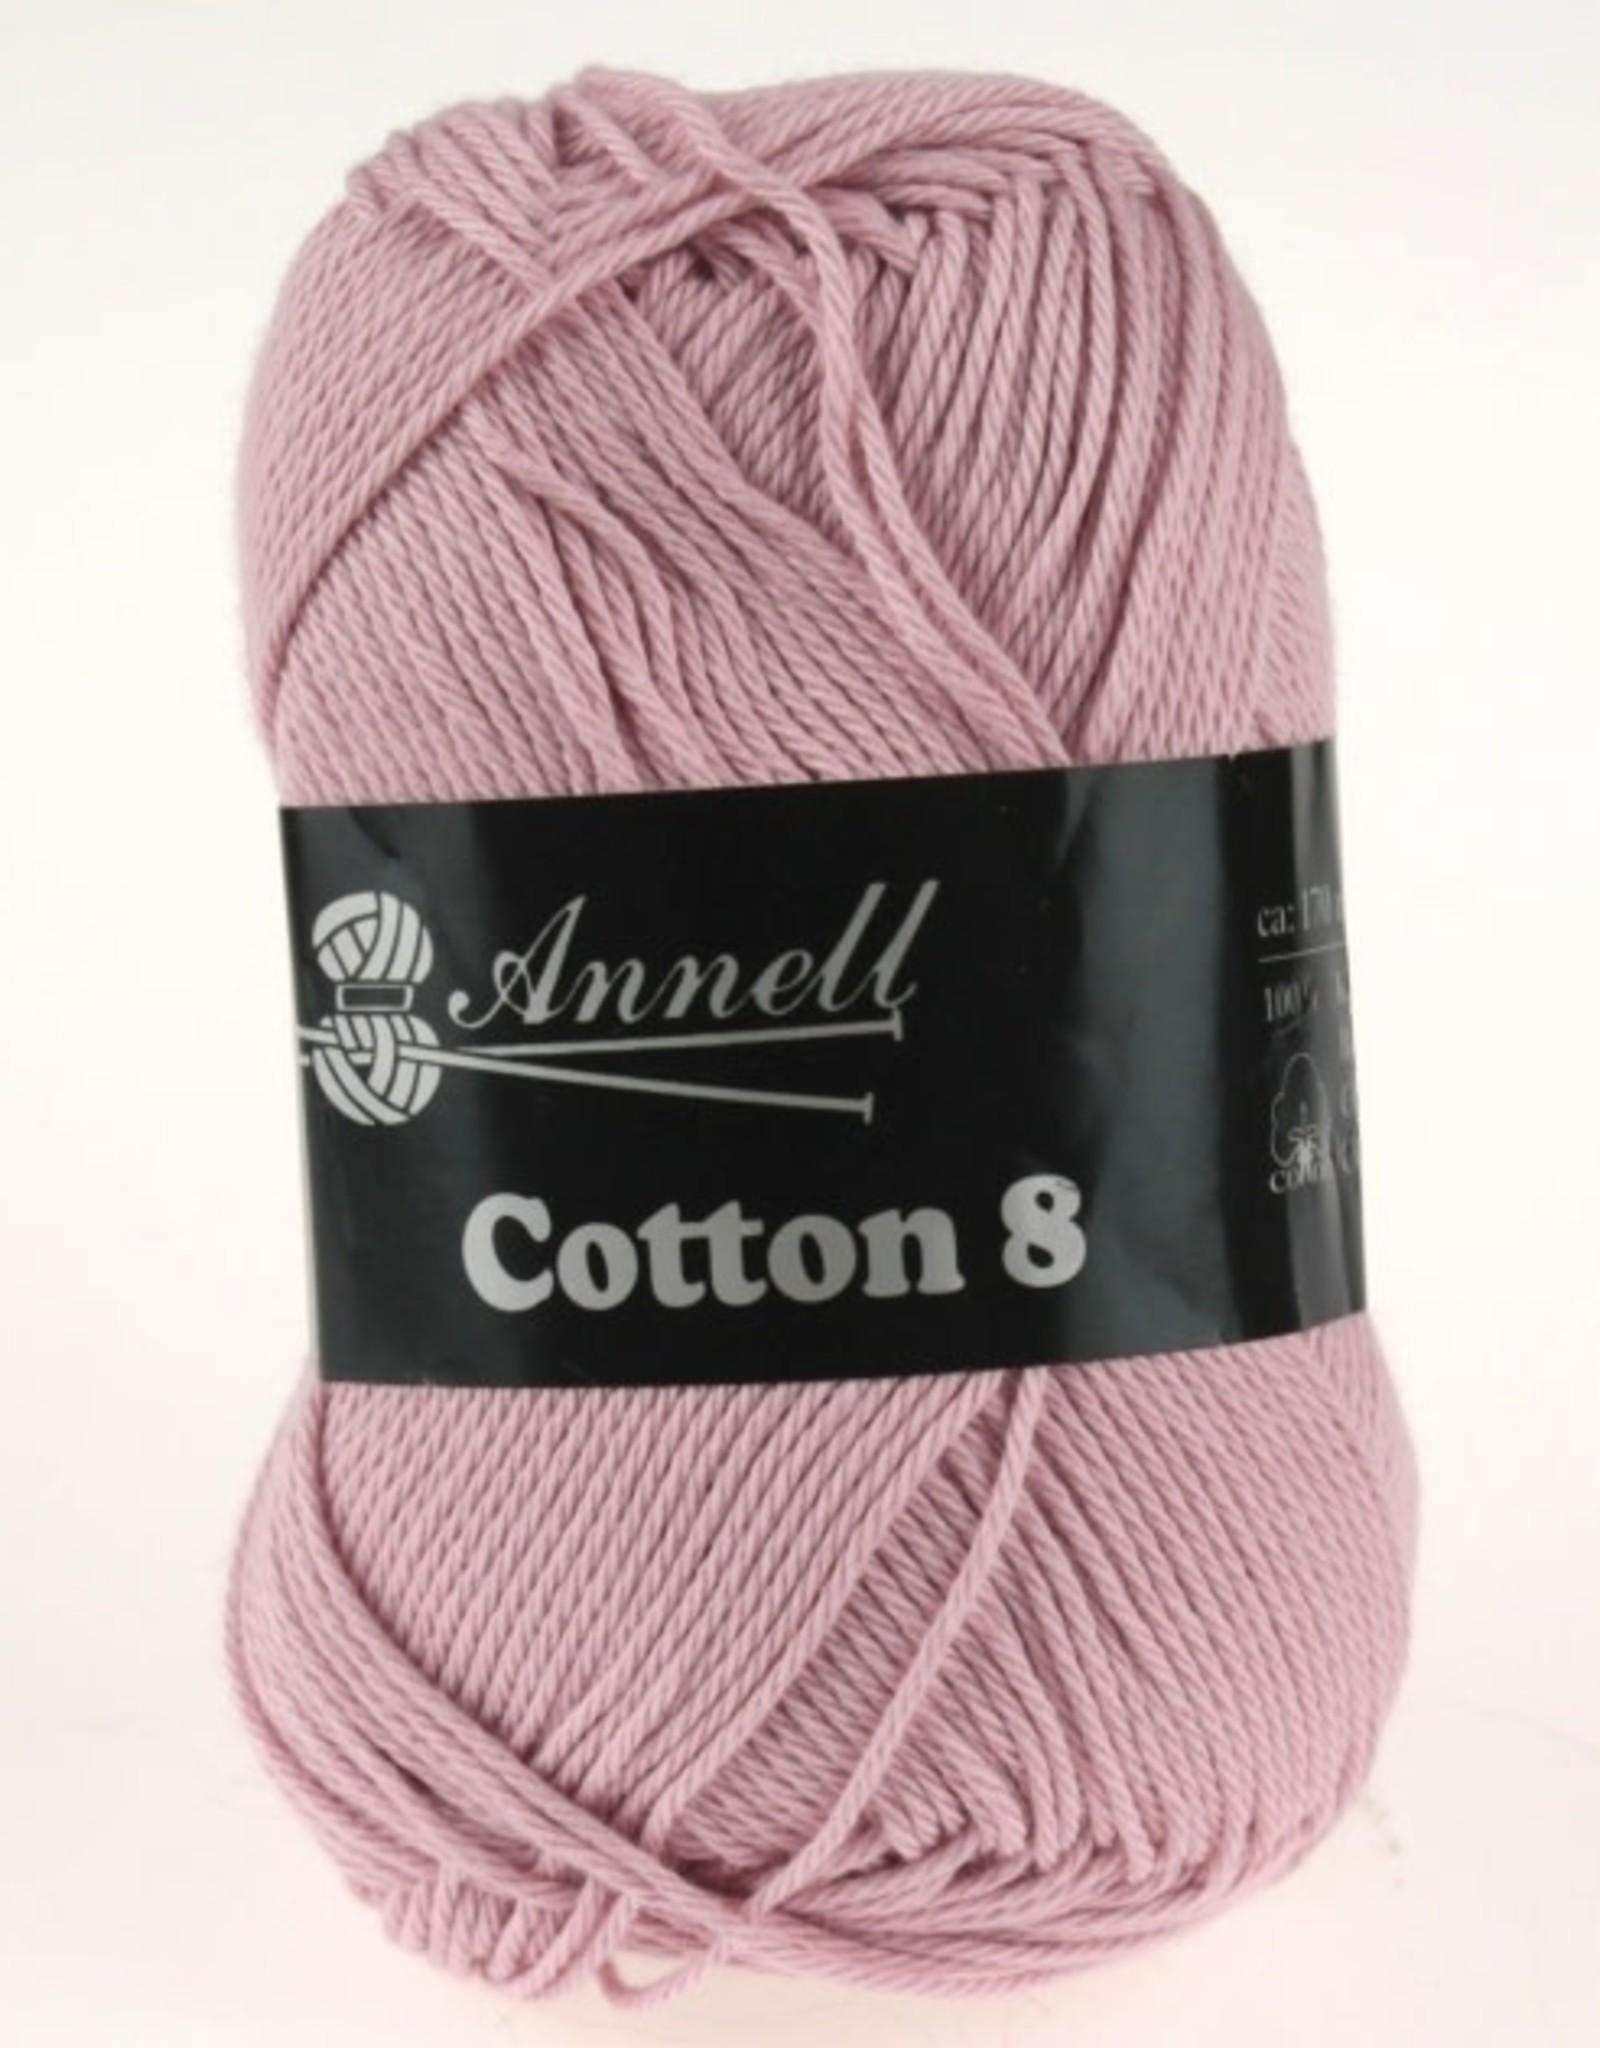 Annell Annell Cotton 8 51